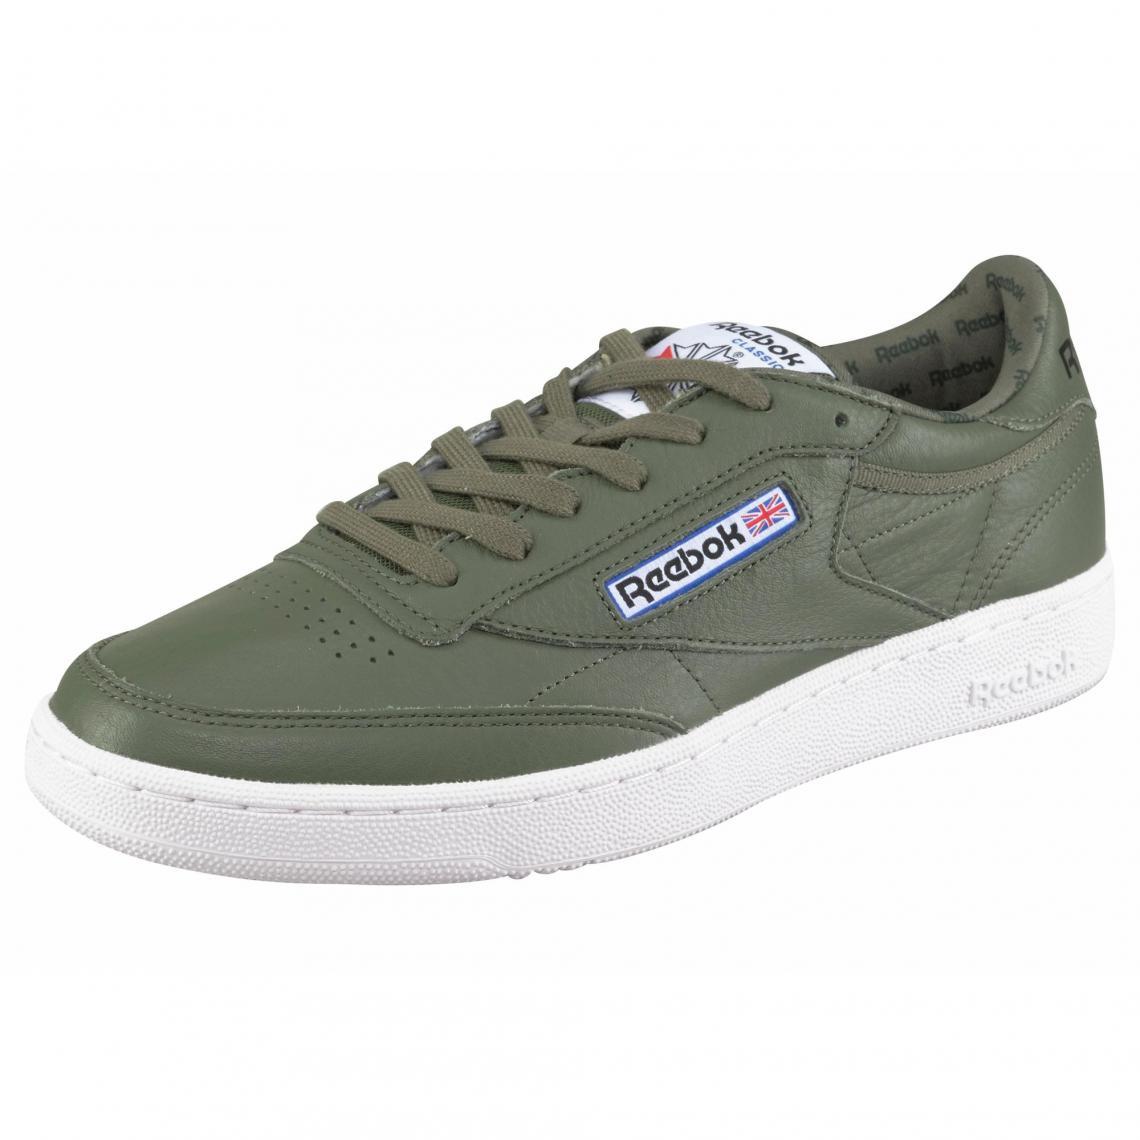 Suisses So De Chaussures Club Reebok Homme Sport Vert C85 Olive3 0PnOk8wX